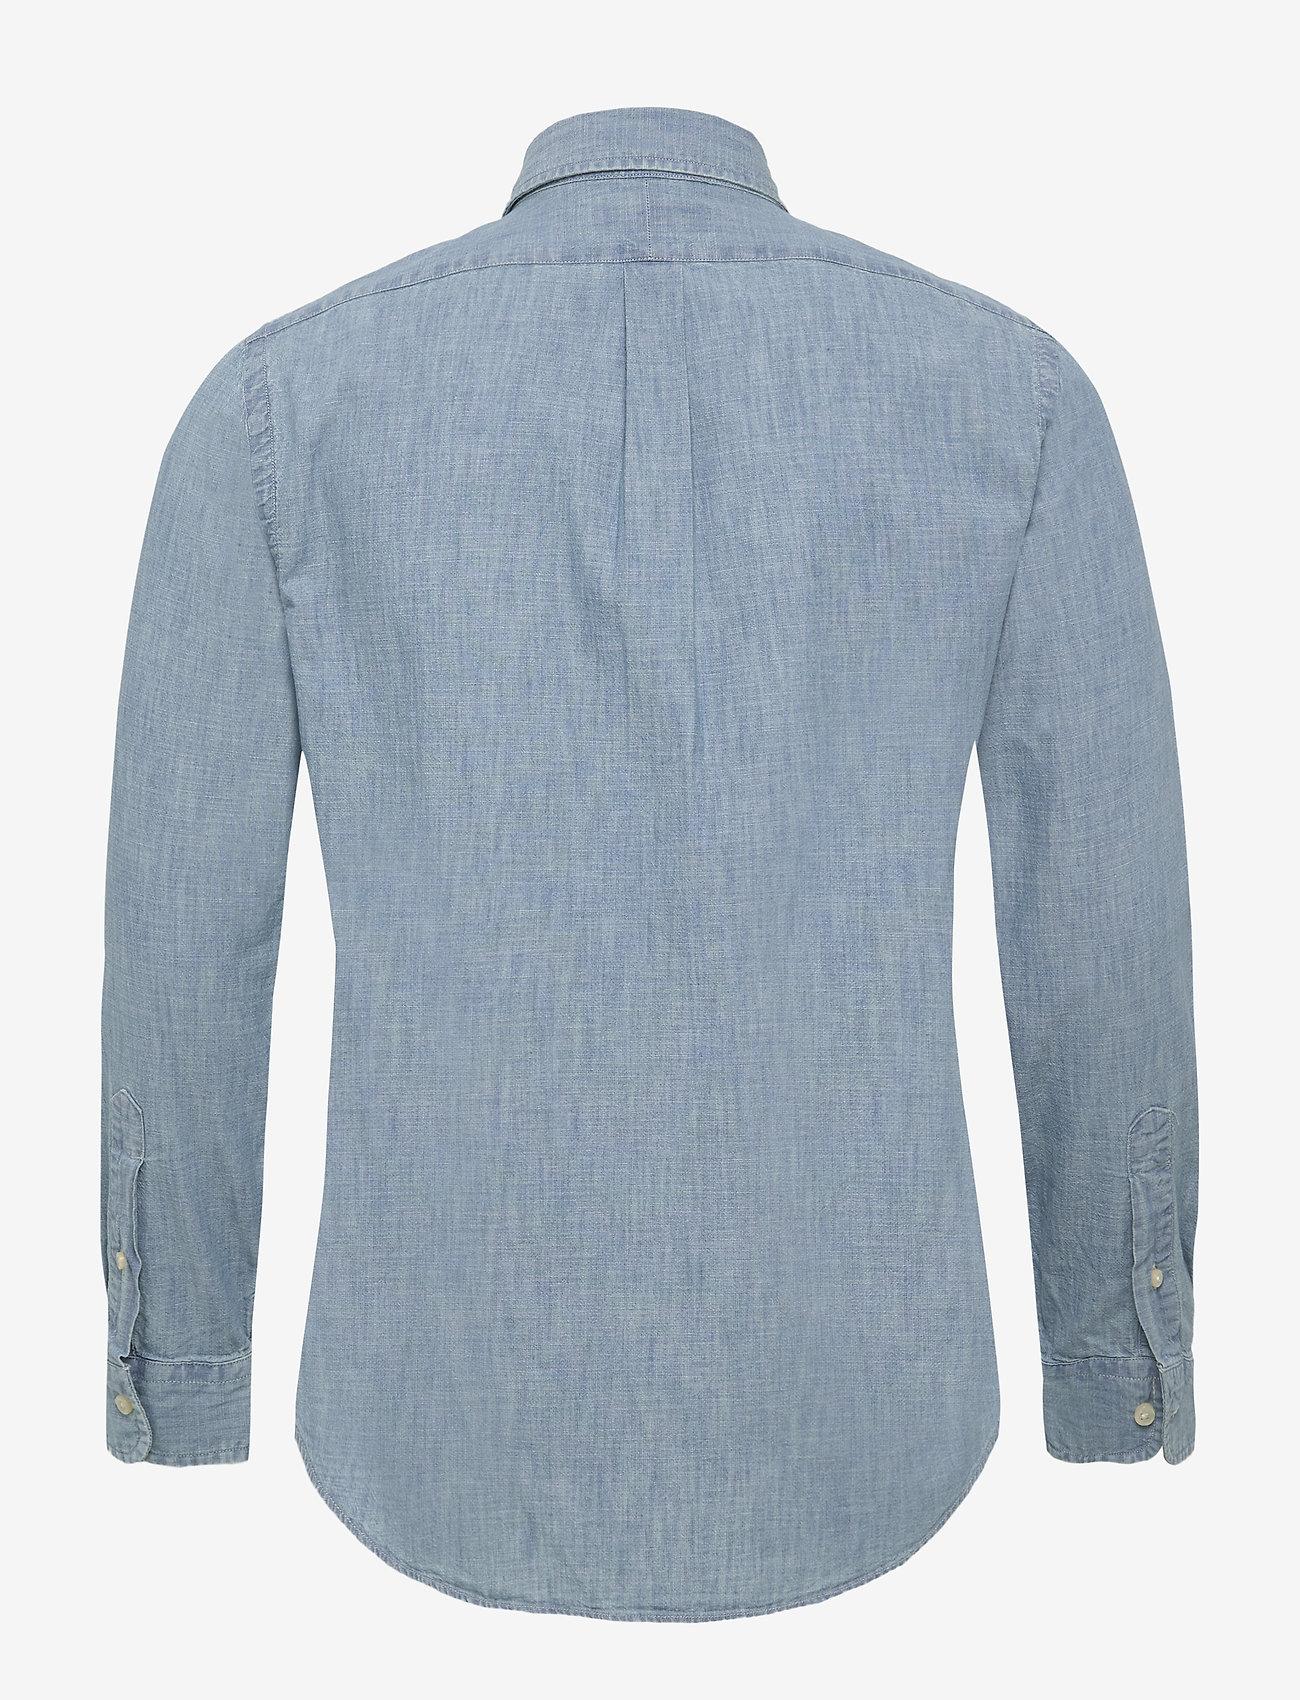 Slim Fit Indigo Chambray Shirt (Light Indigo) - Polo Ralph Lauren lWmg8m